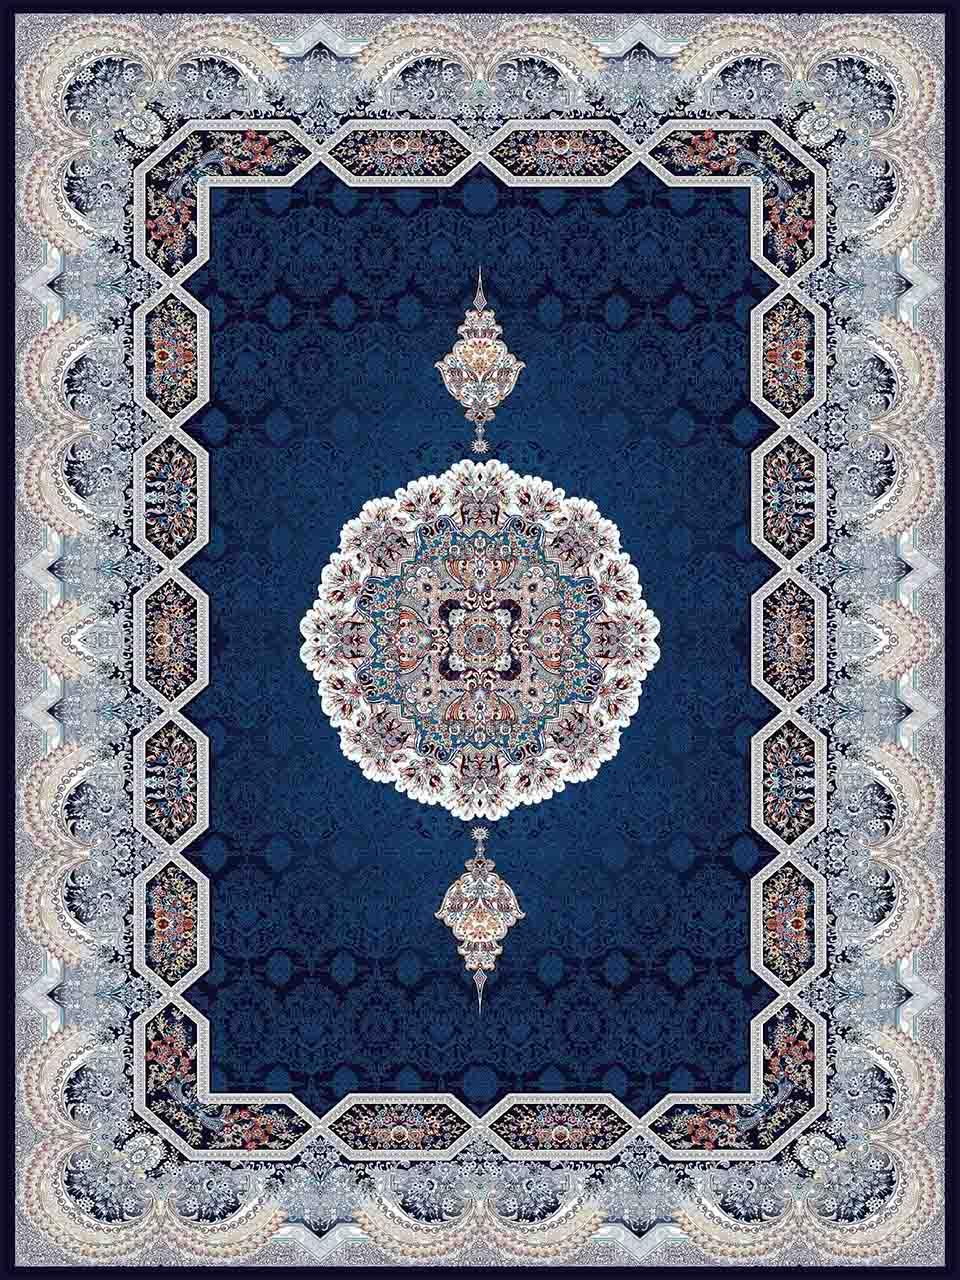 فرش (25037) اکریلیک - 8 رنگ - 700 شانه - سورمه اي - تراکم 2550